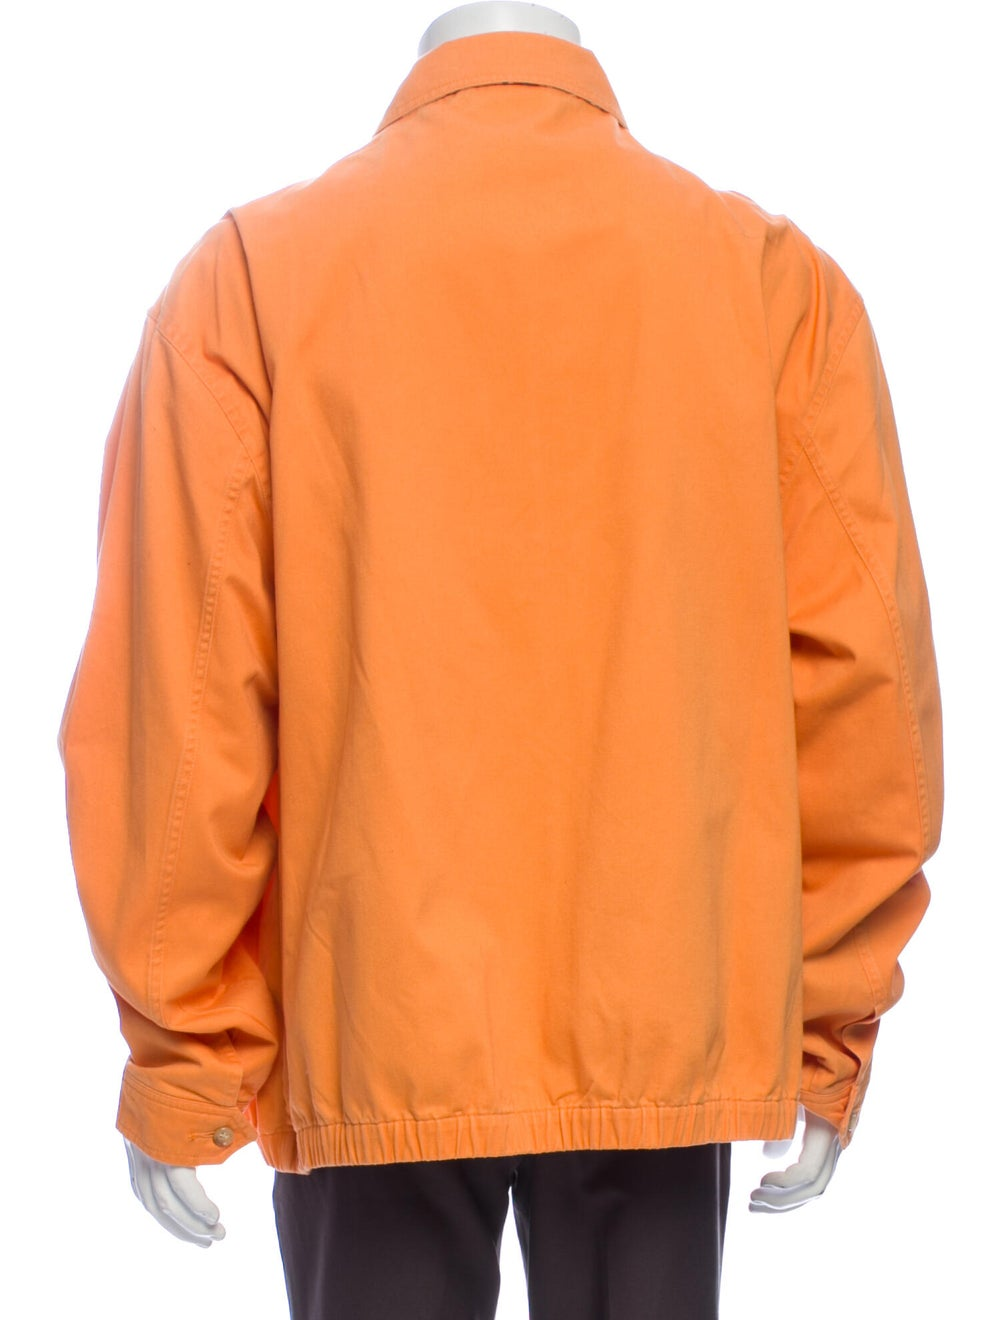 Polo Ralph Lauren Jacket Orange - image 3